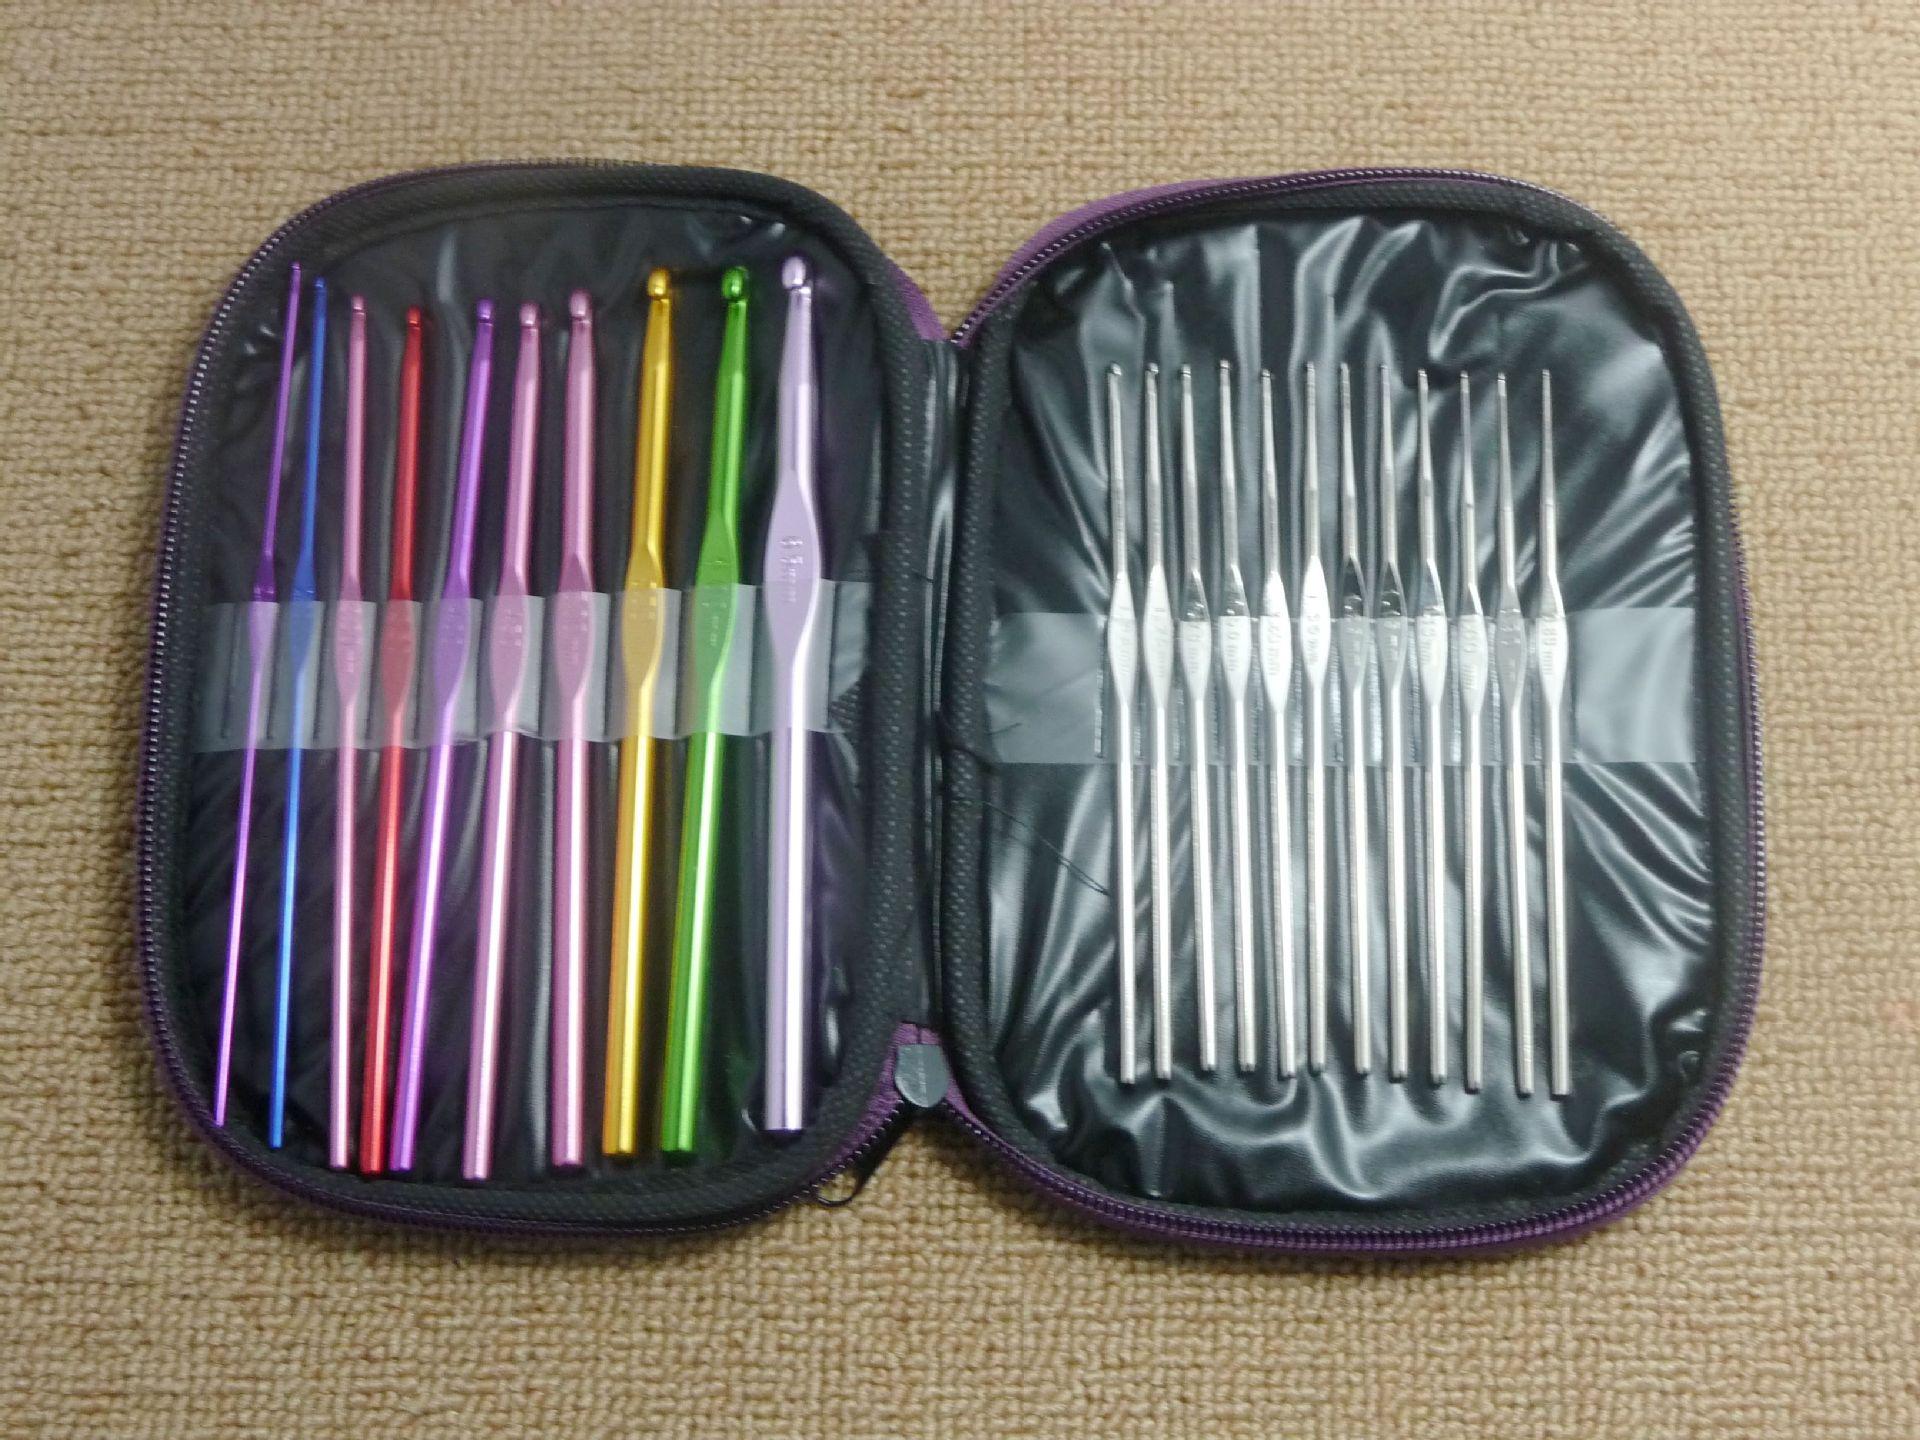 22 Multi-colour Aluminum Crochet Hooks Needles Yarn Weave Knit Craft Set w// Case